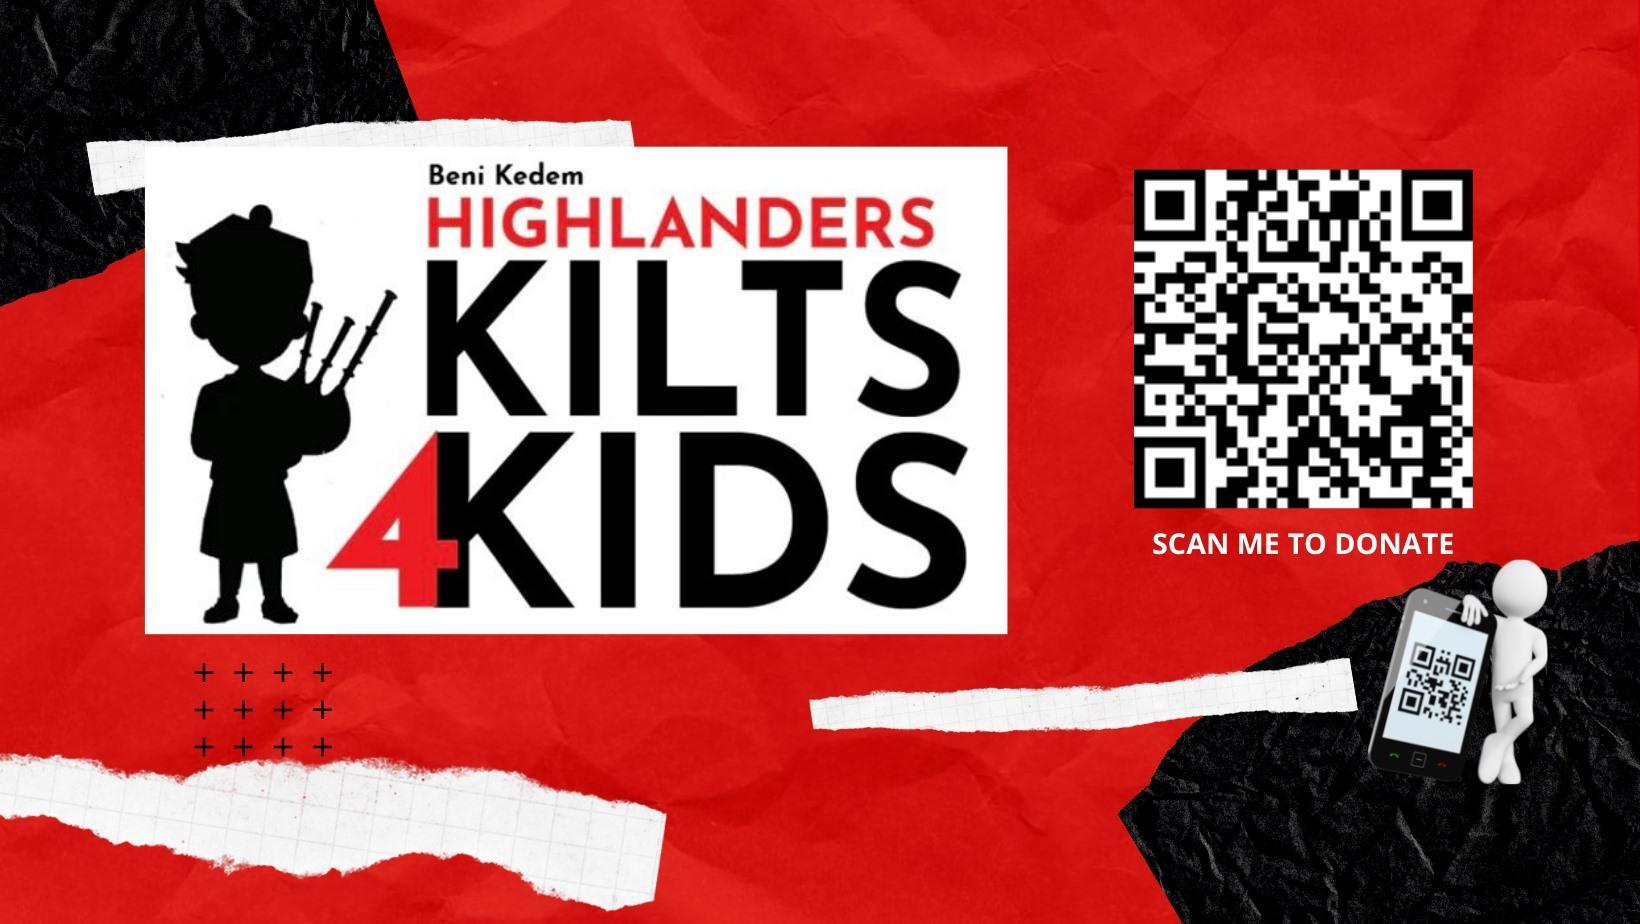 kilts4kids donation